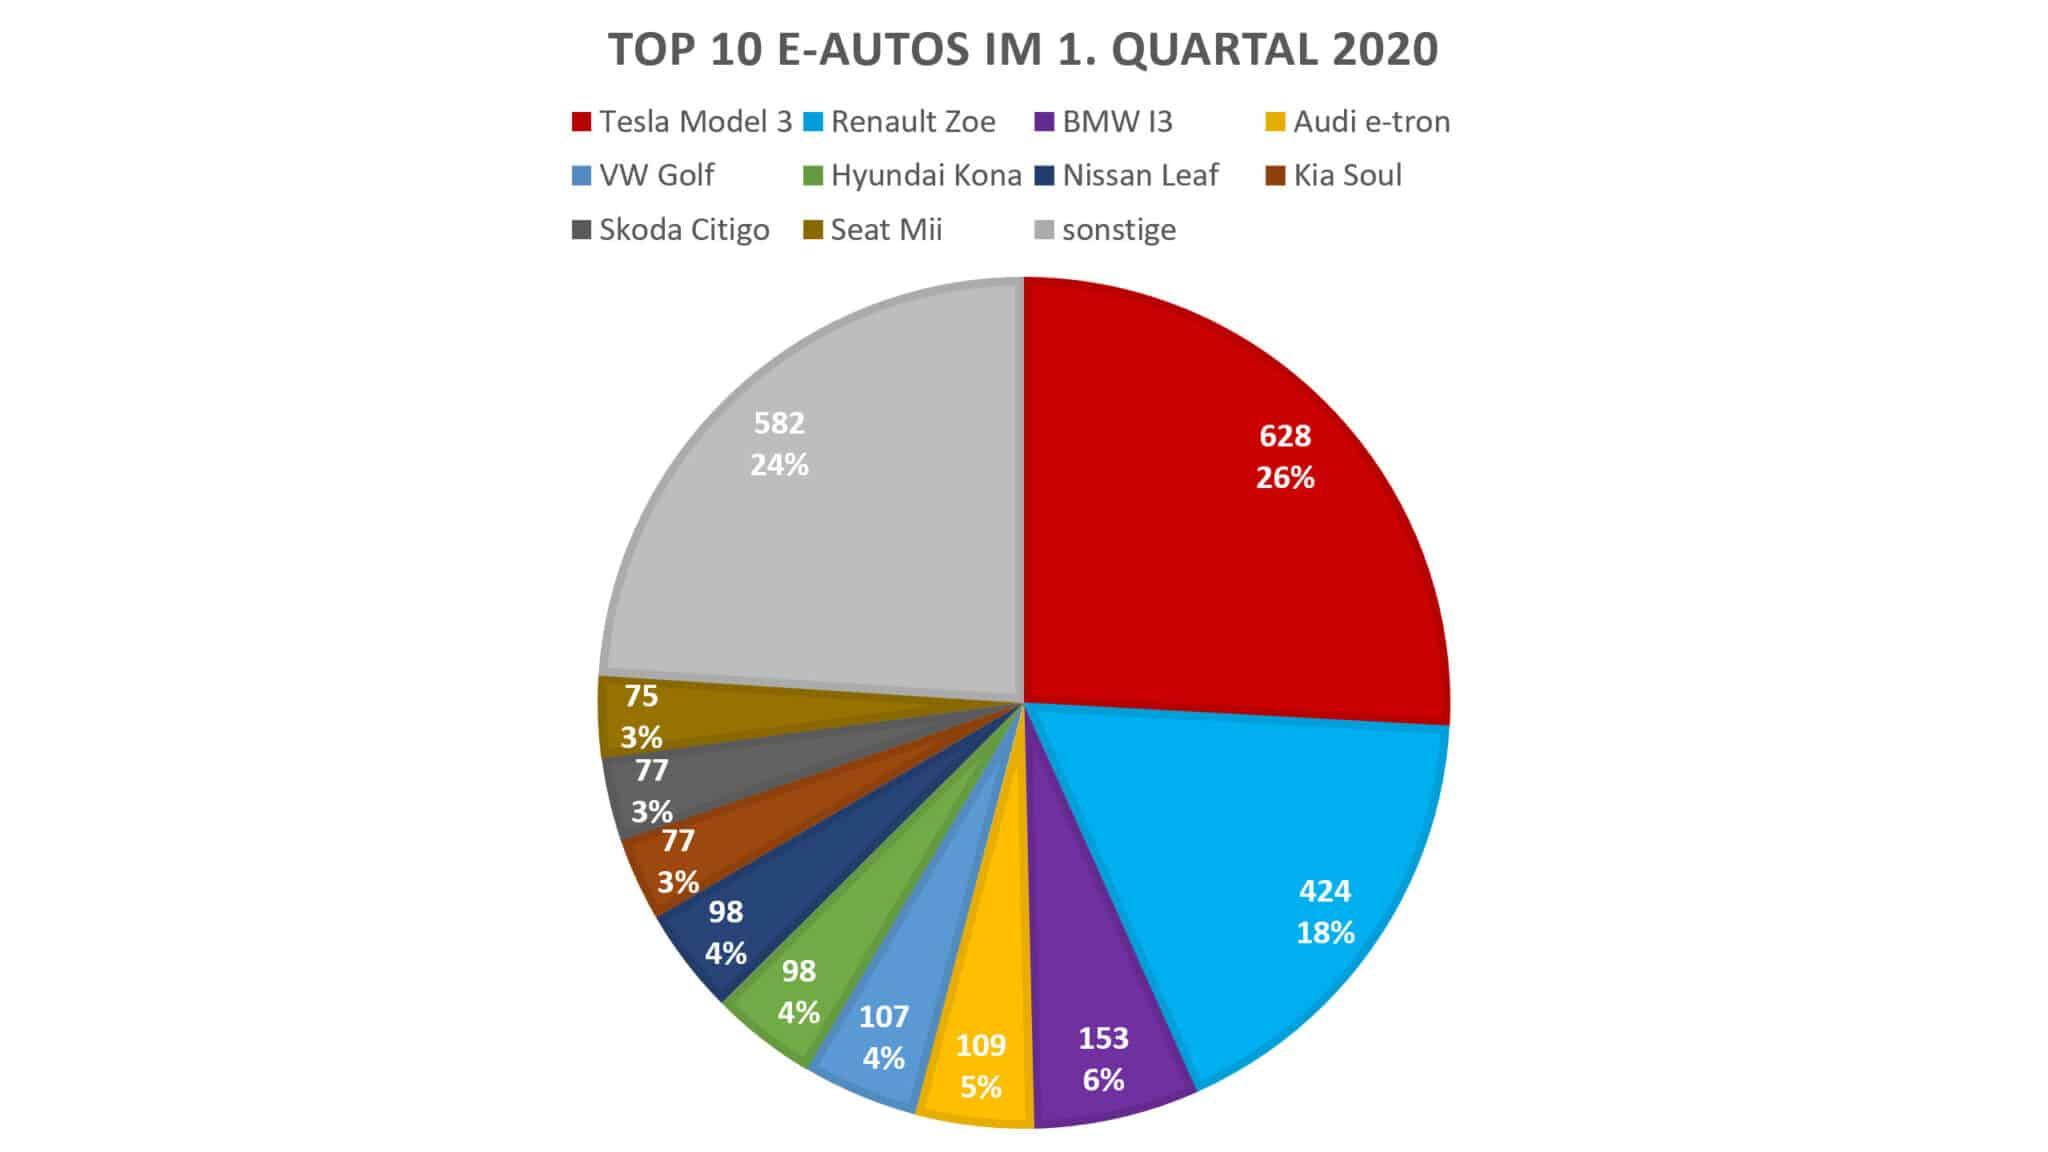 PKW Neuzulassungsstatistik im 1. Quartal 2020 | BEV Top 10 1Q2020 scaled